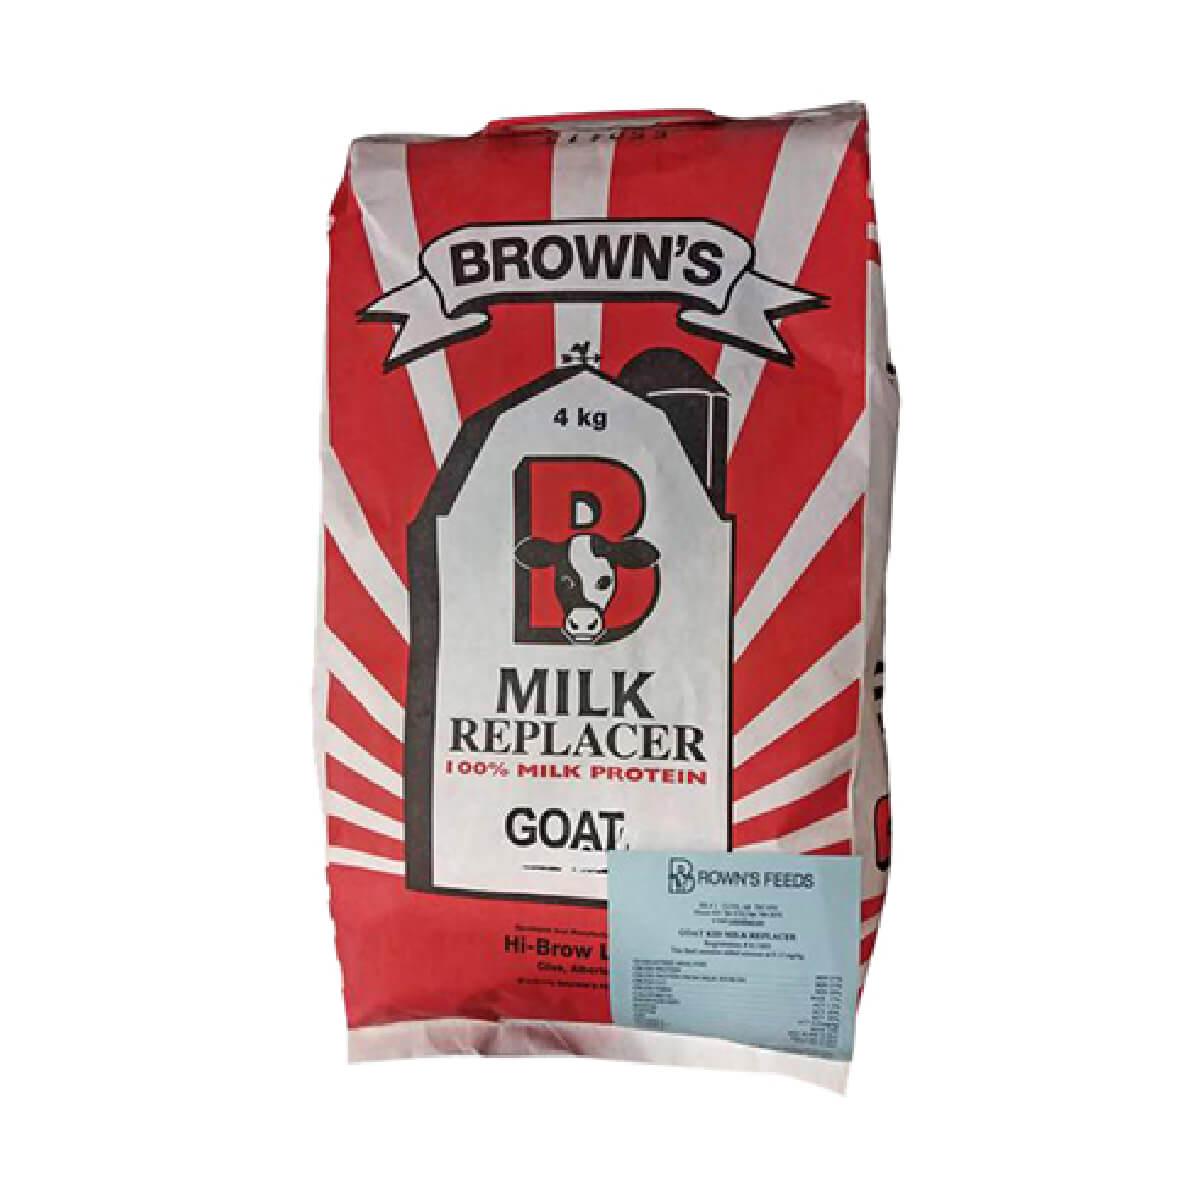 Brown's Goat/Kid Milk Replacer - 4 kg